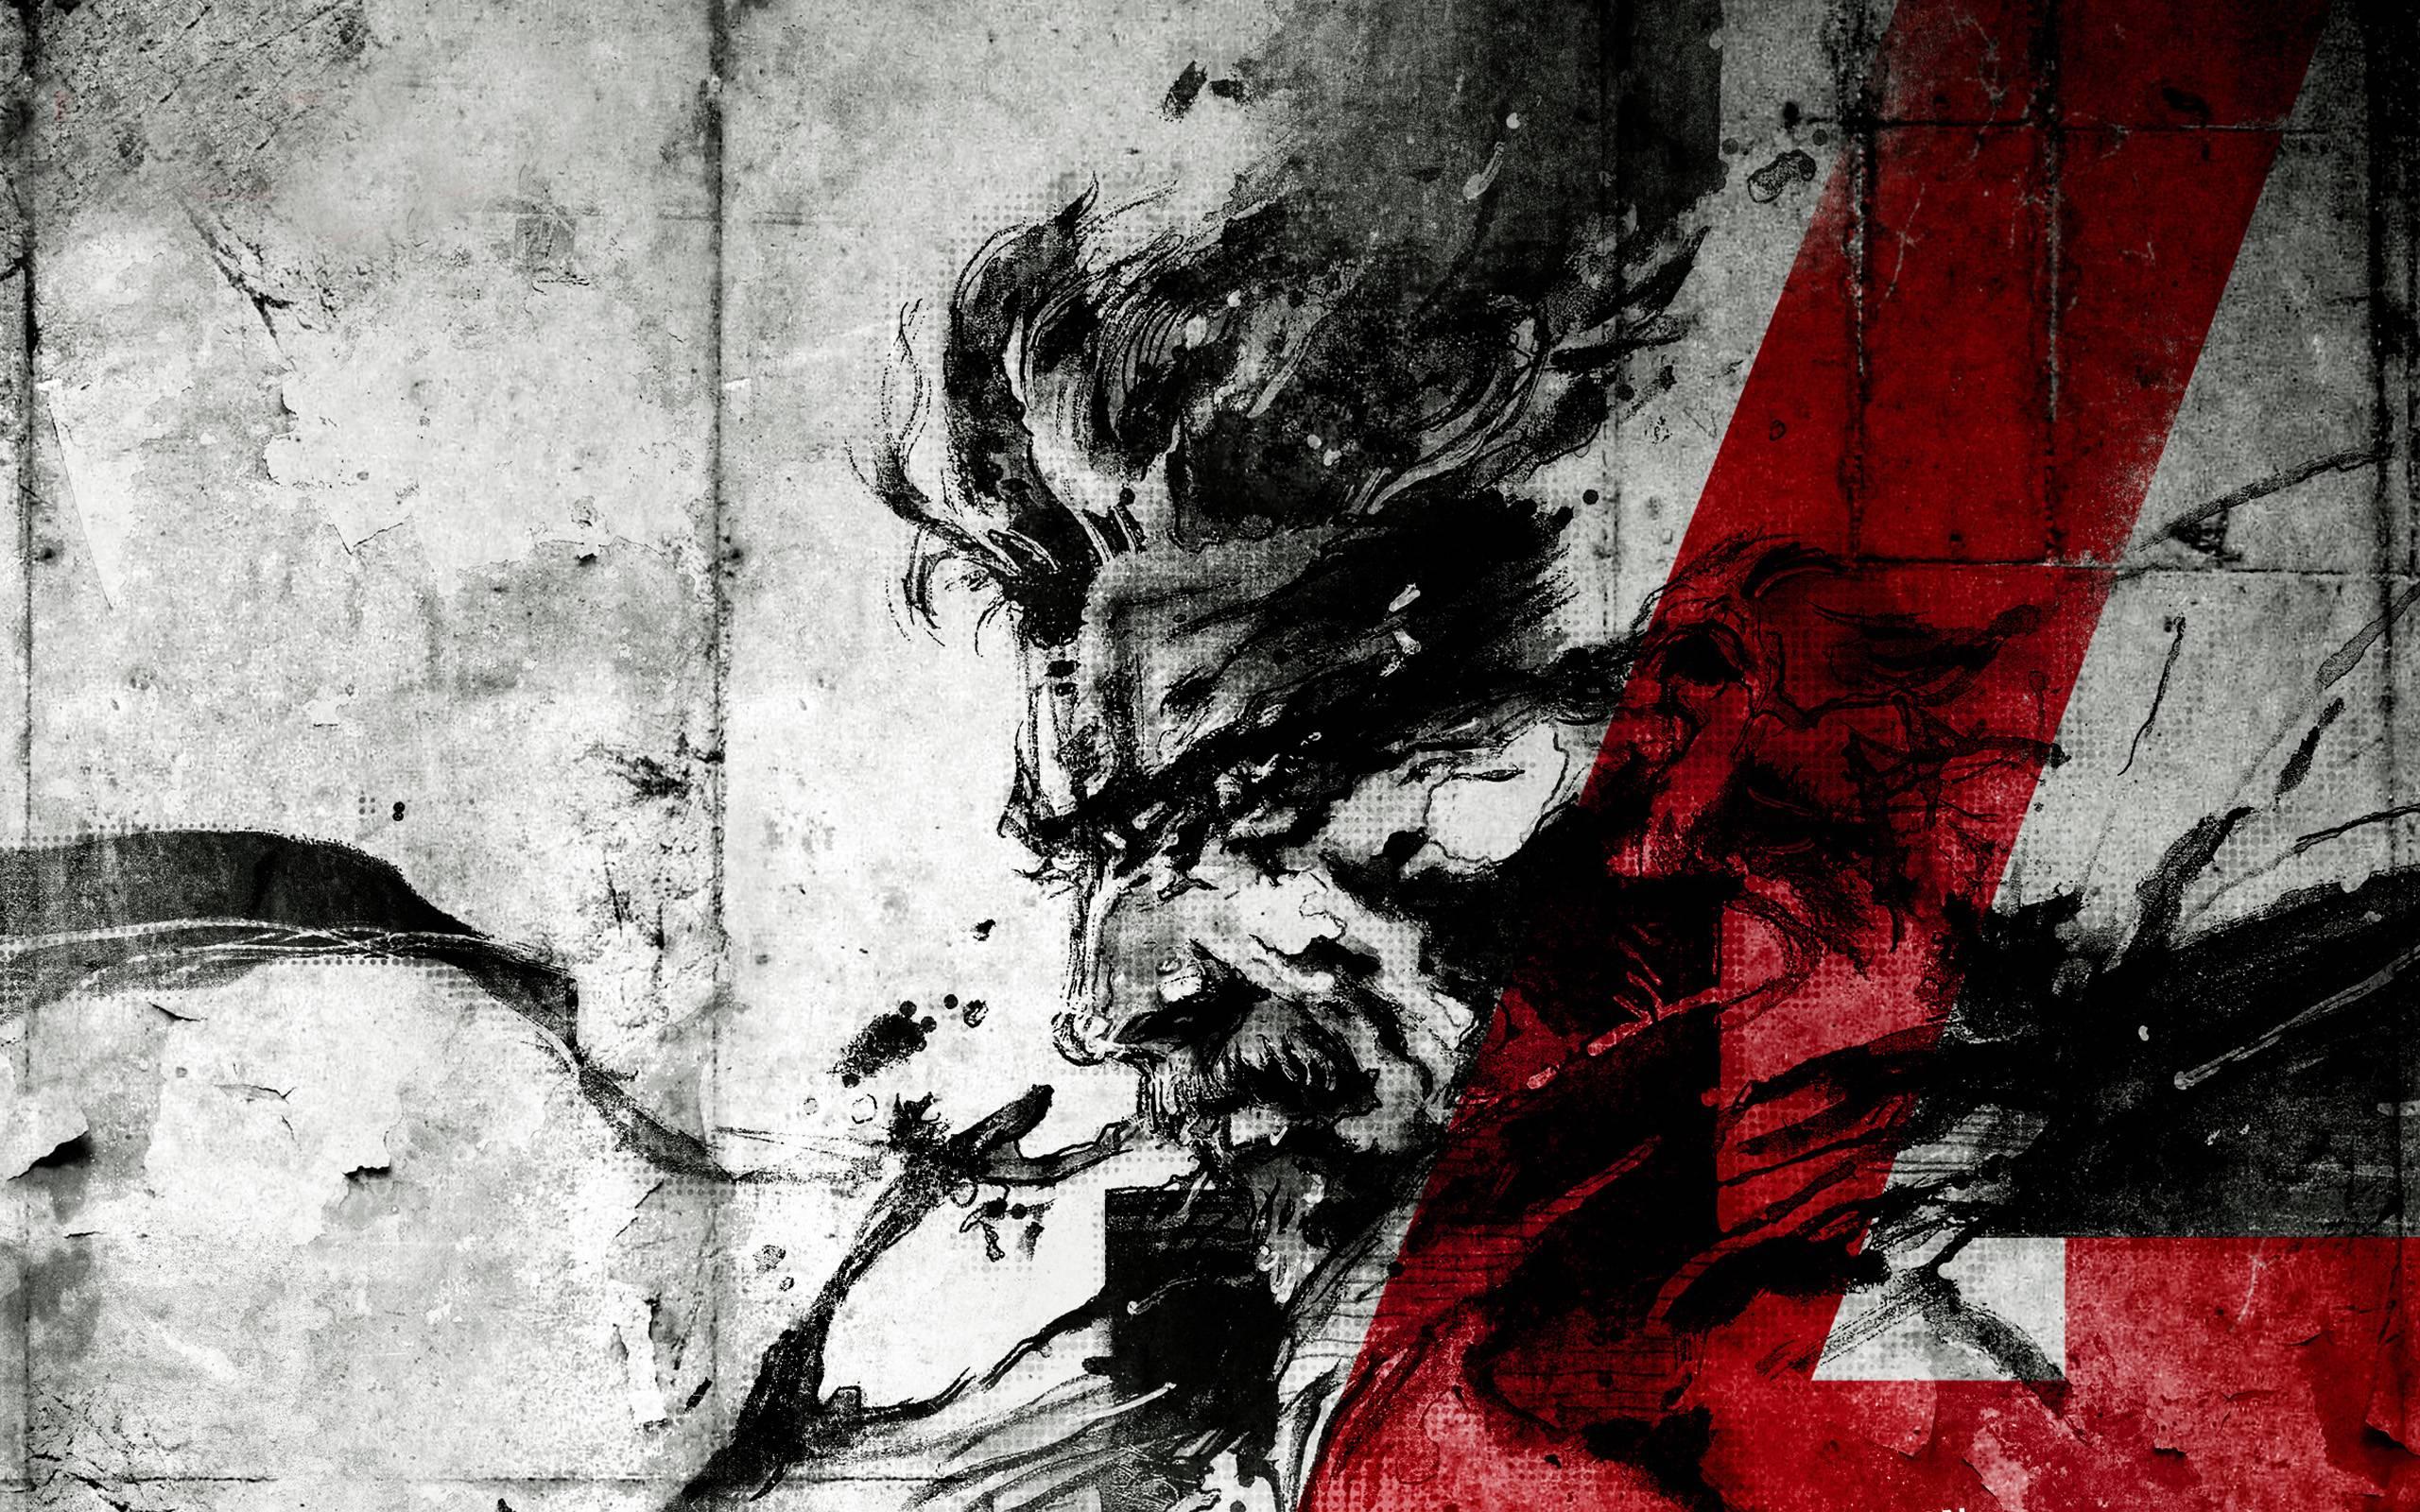 Metal Gear Solid Wallpapers Wallpaper Cave